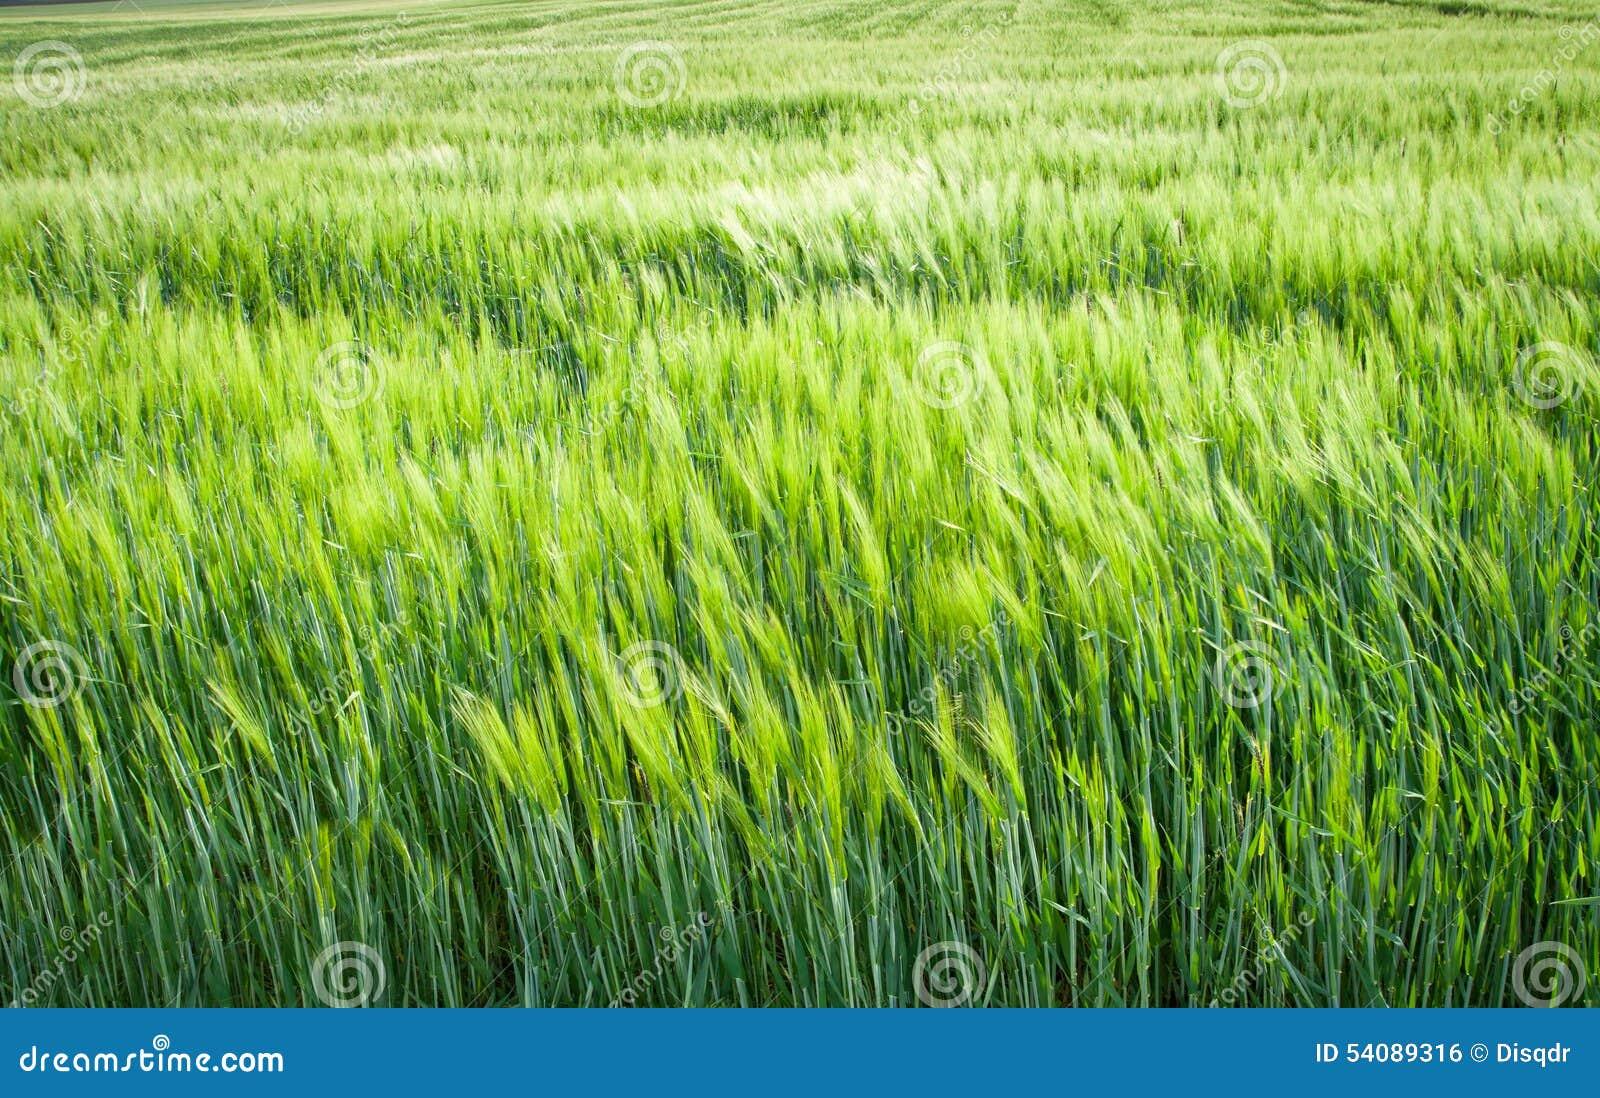 Groene ingediende gewassen